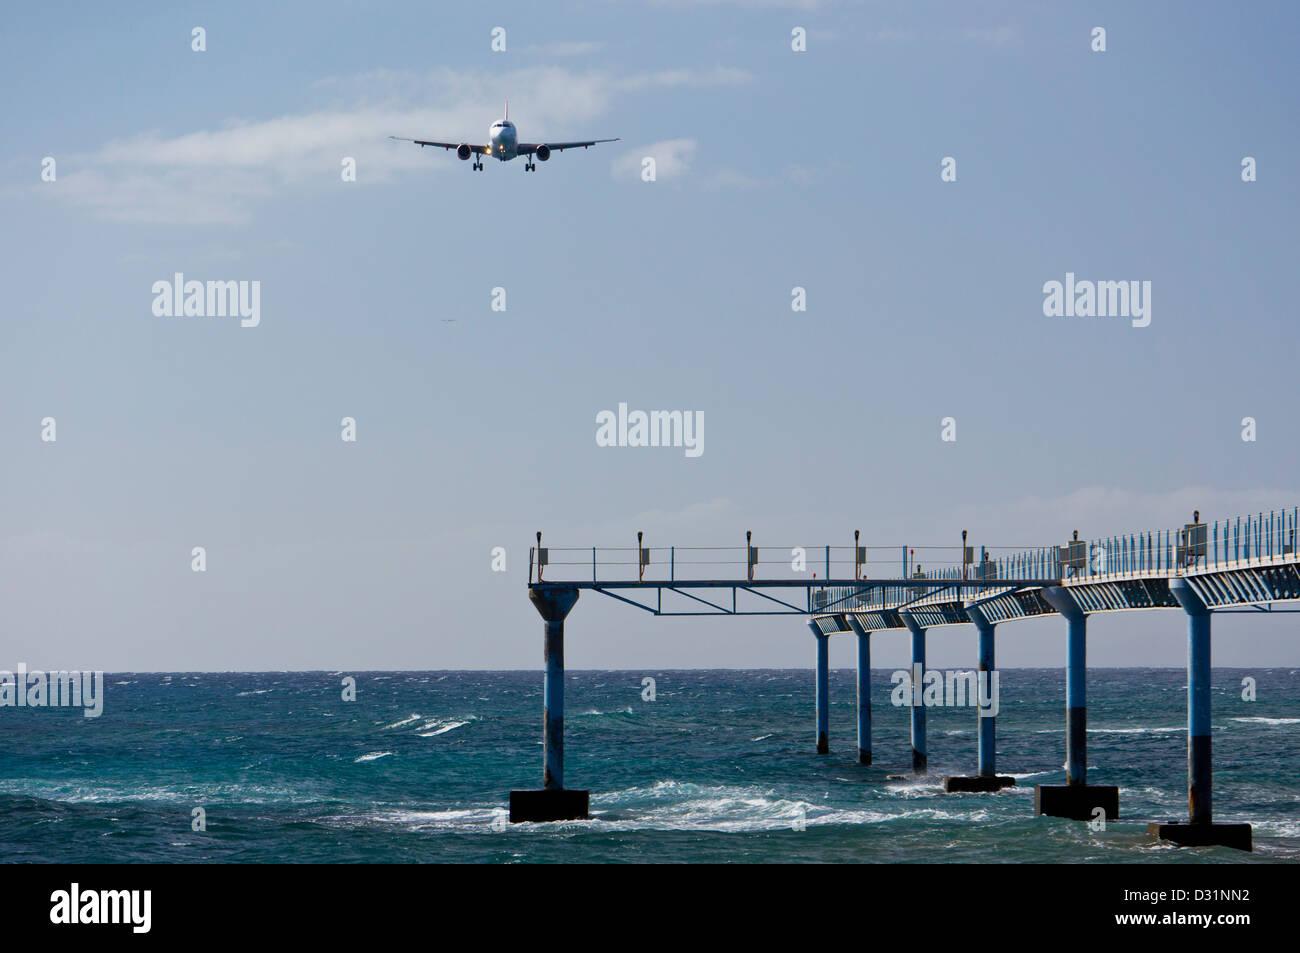 Arricife Flughafen Landung leuchtet Lanzarote Kanarische Inseln Stockbild